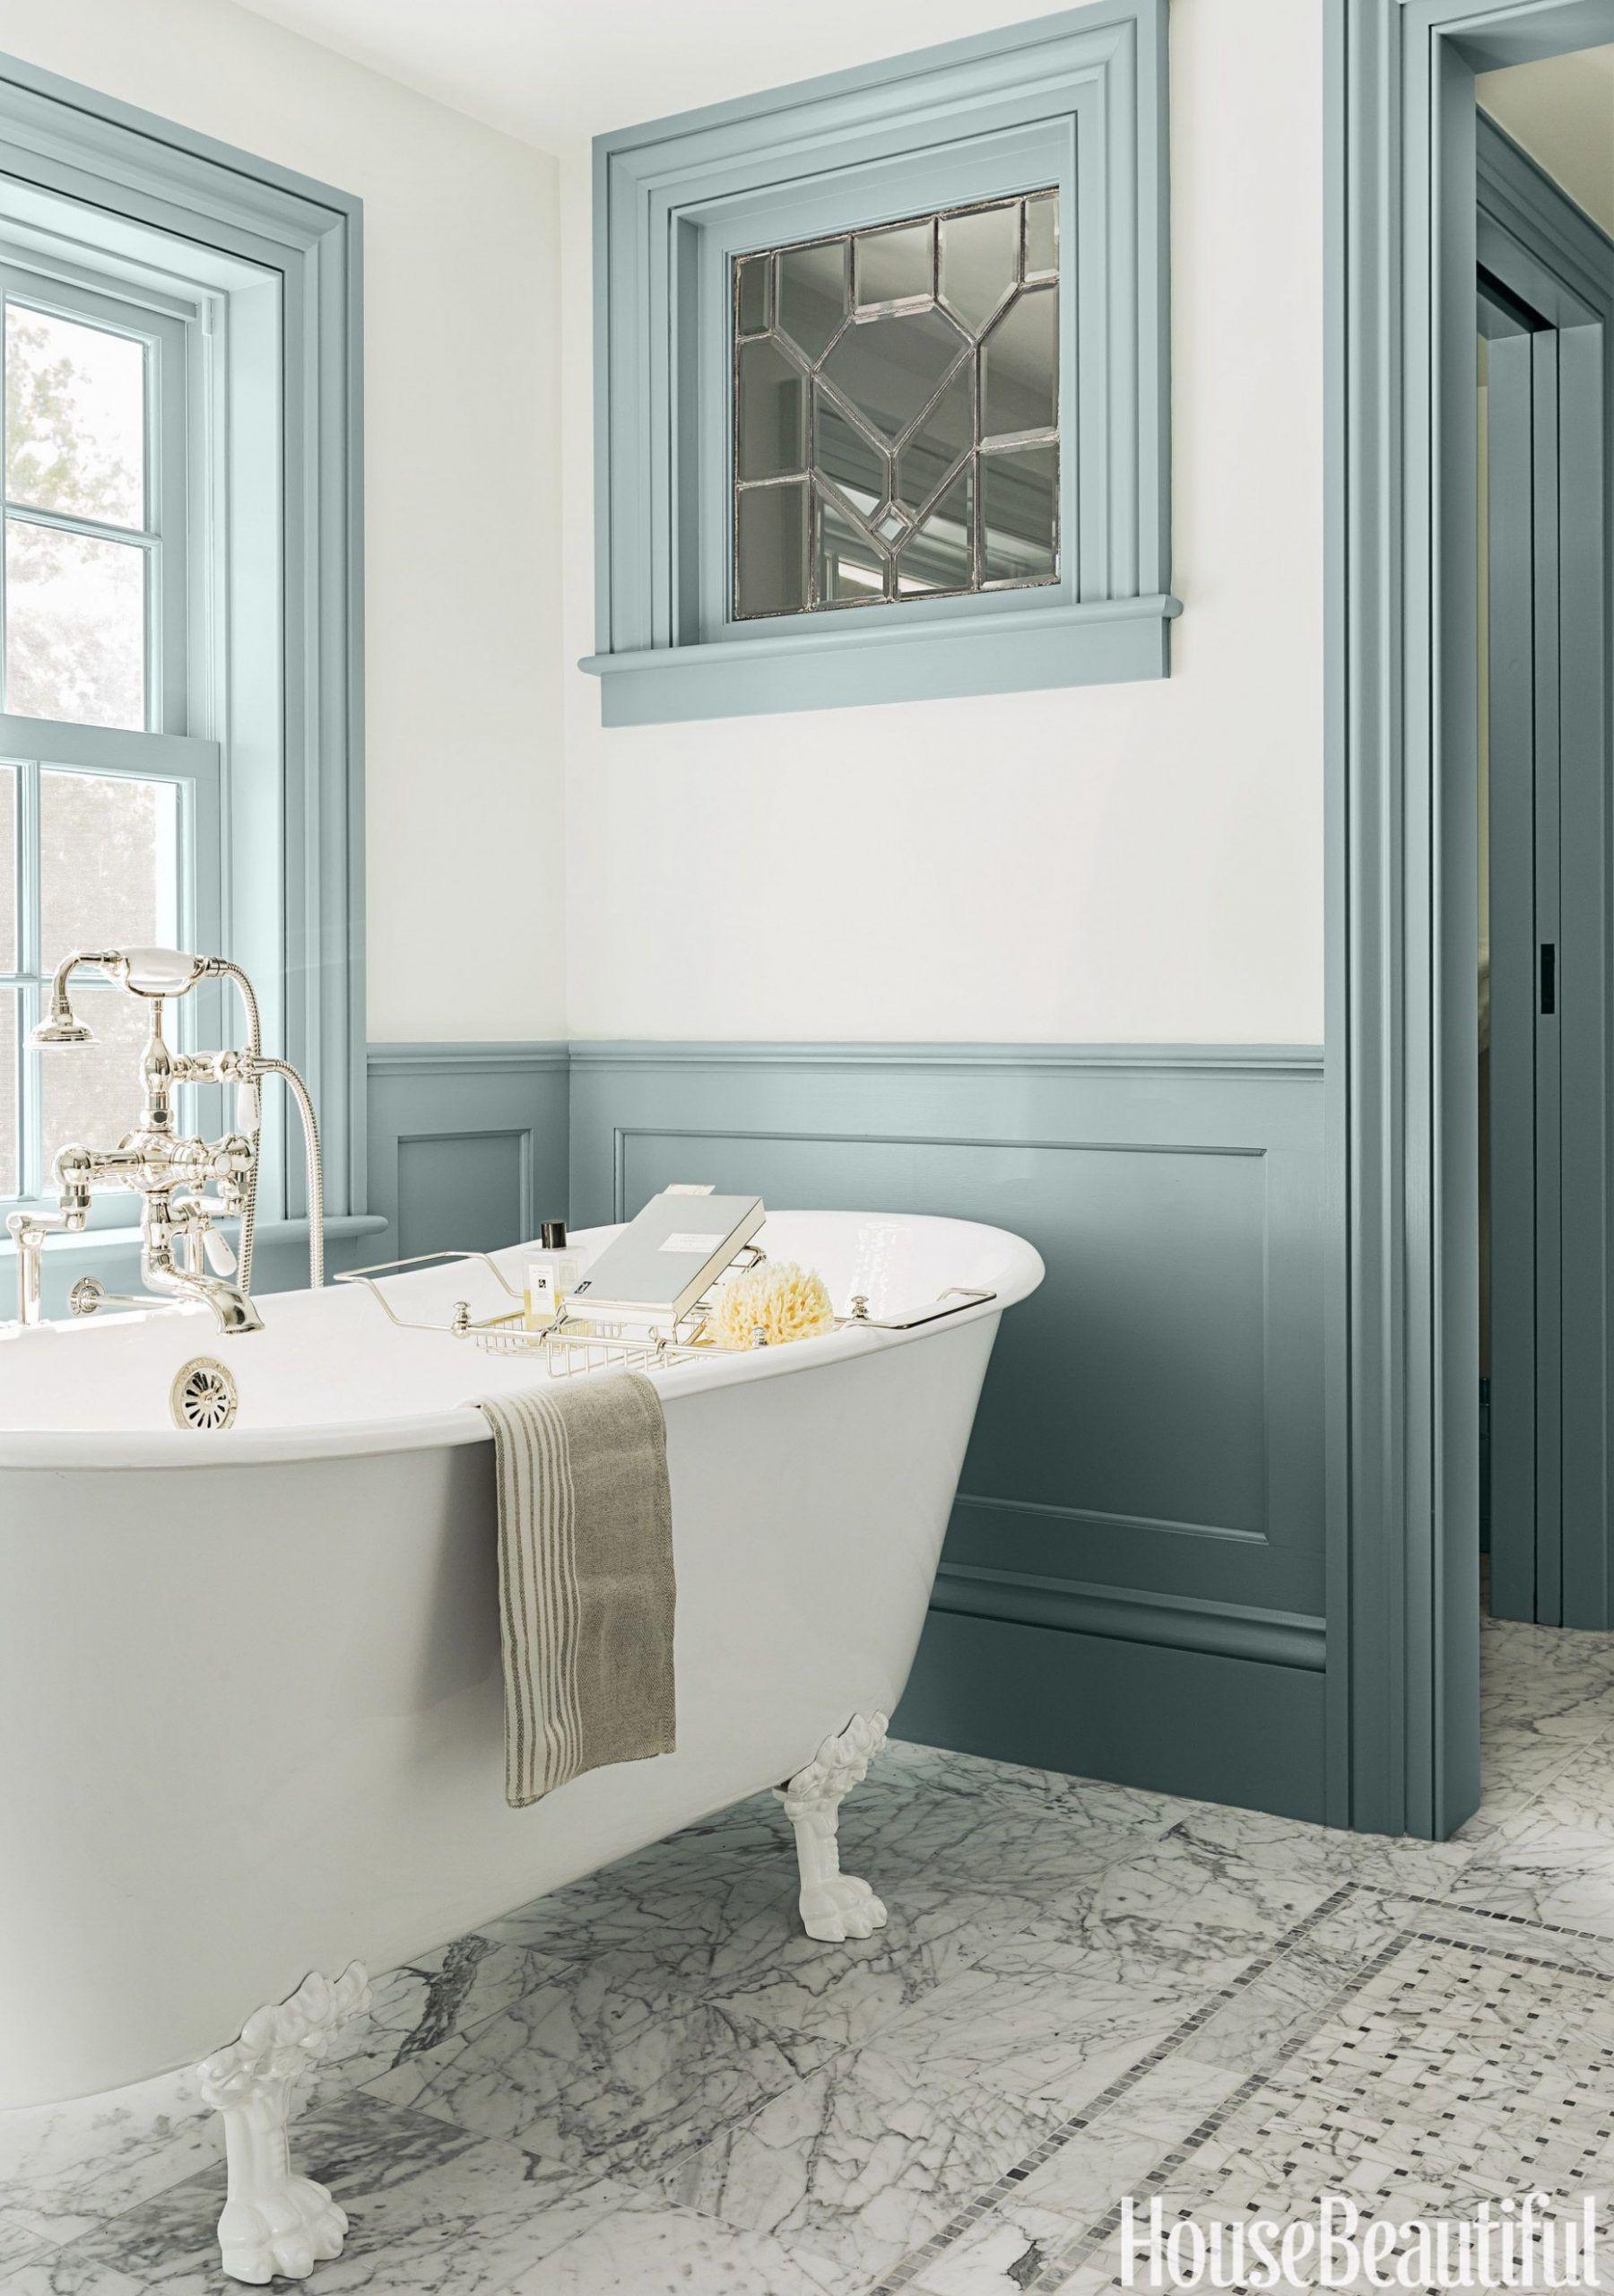 8 X 8 Master Bathroom Layout Ideas Timeless Bathroom Classic Bathroom Design Traditional Bathroom Designs Bathroom design x 8